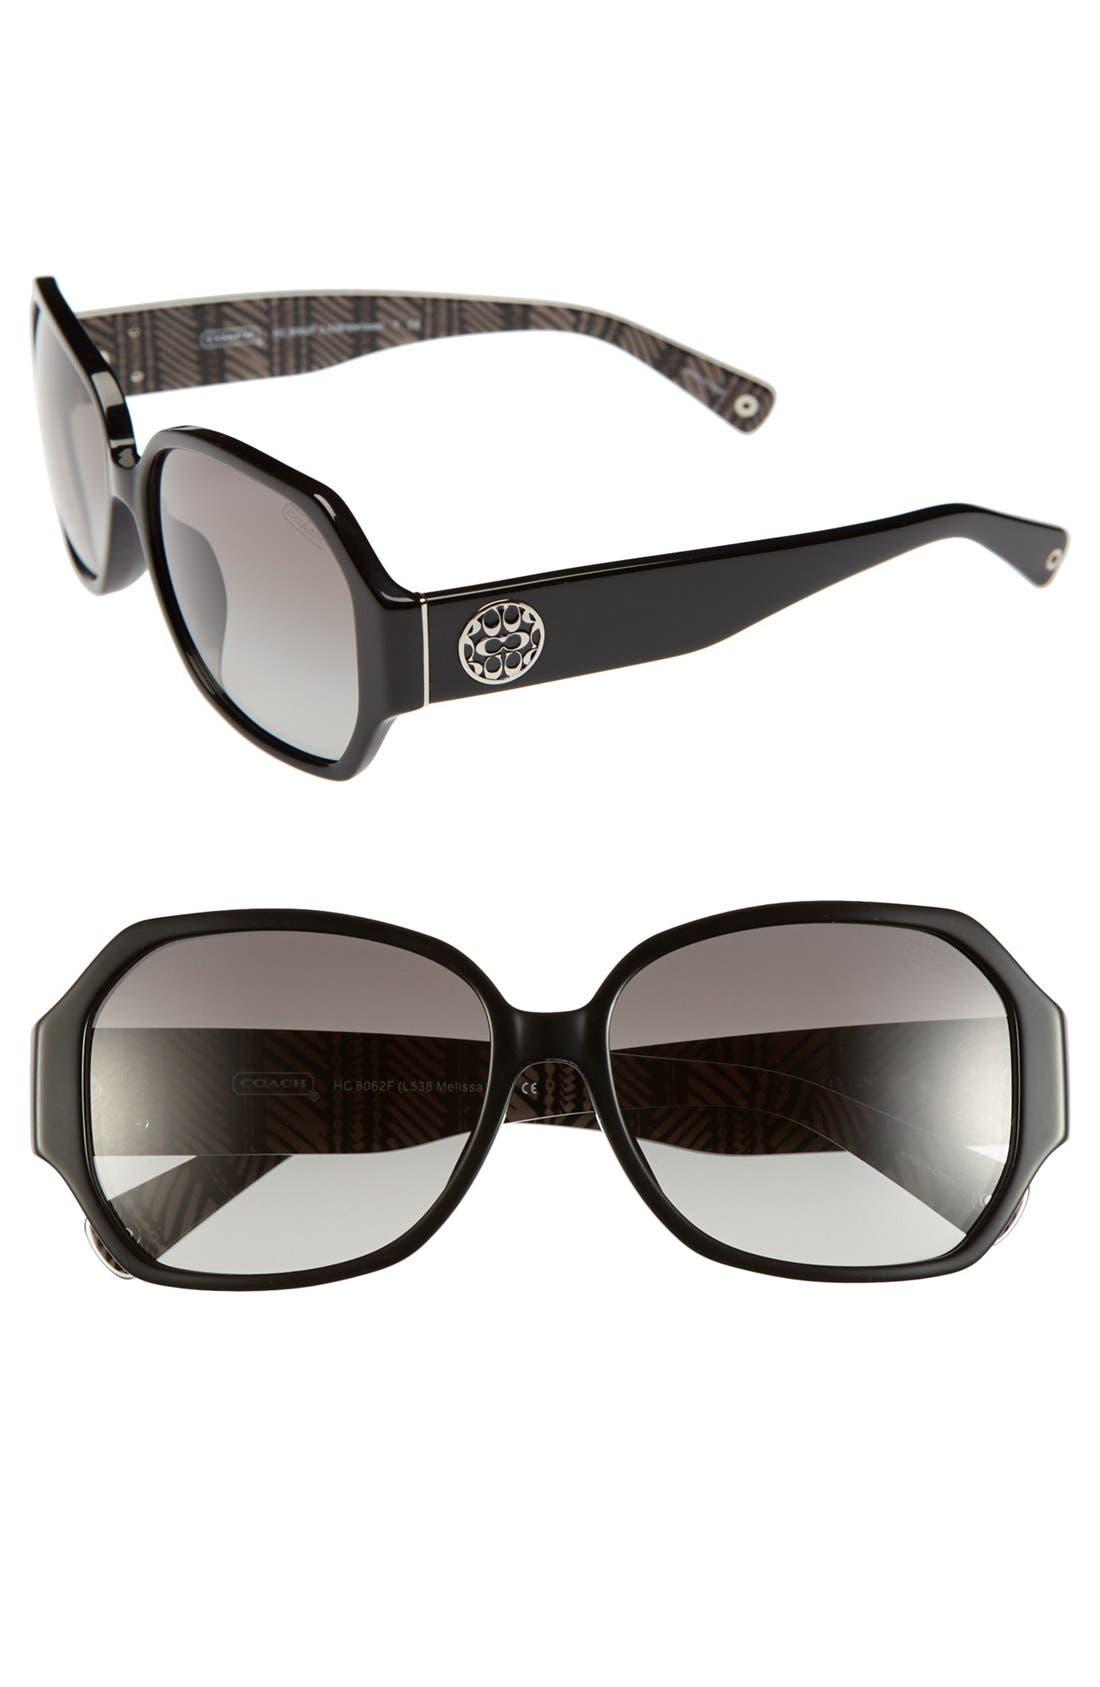 Alternate Image 1 Selected - COACH 58mm Retro Sunglasses